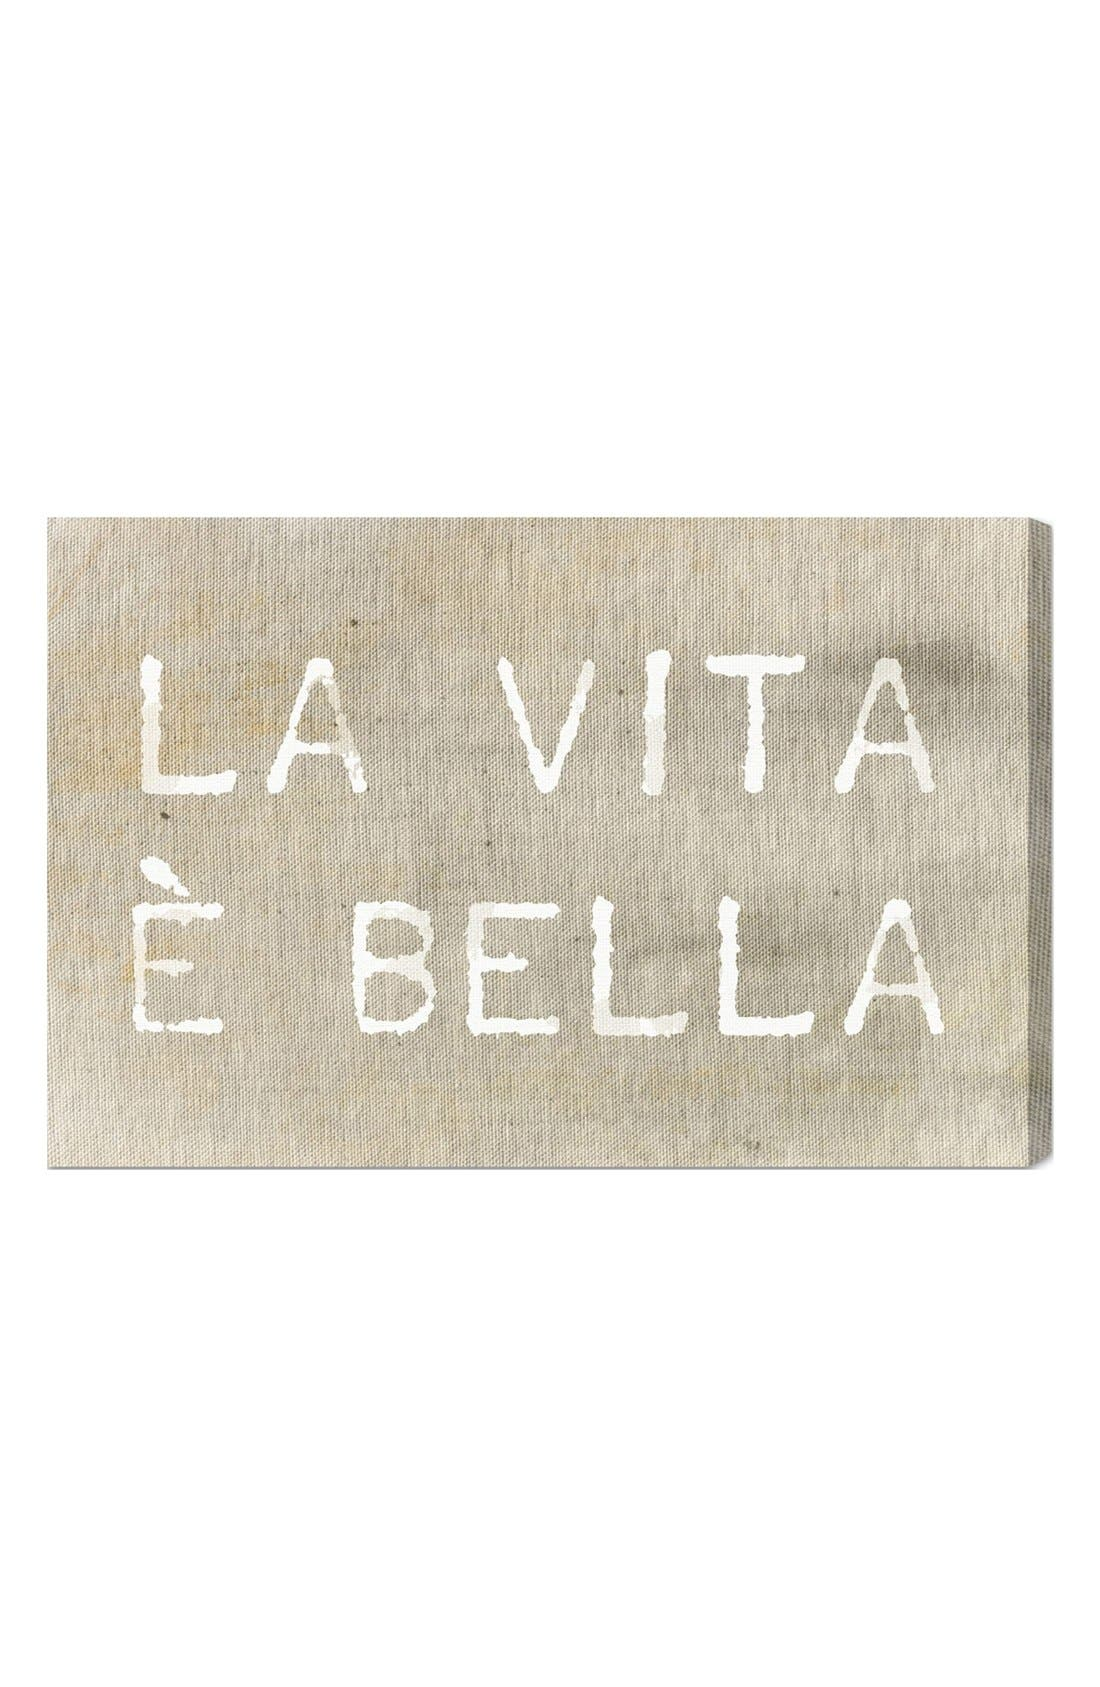 Main Image - Oliver Gal 'La Vita È Bella' Wall Art